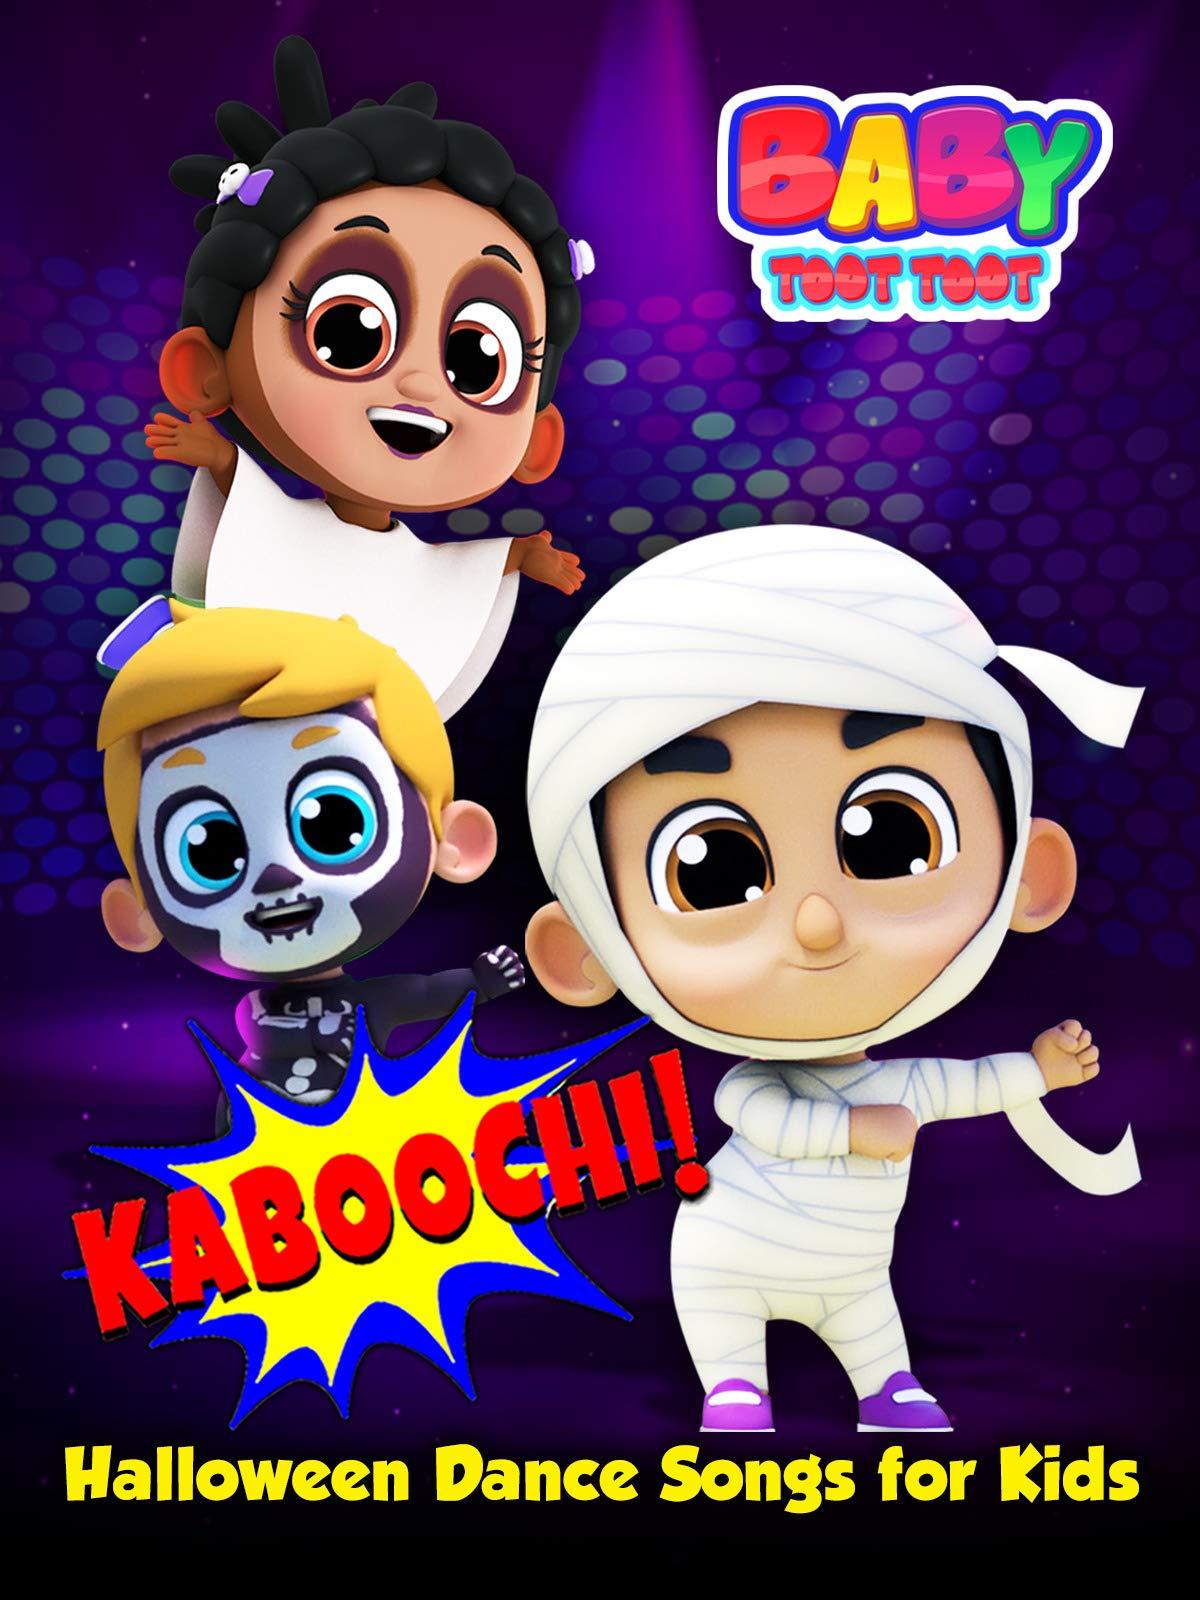 Kaboochi! Halloween Dance Songs for Kids - Baby Toot Toot on Amazon Prime Video UK